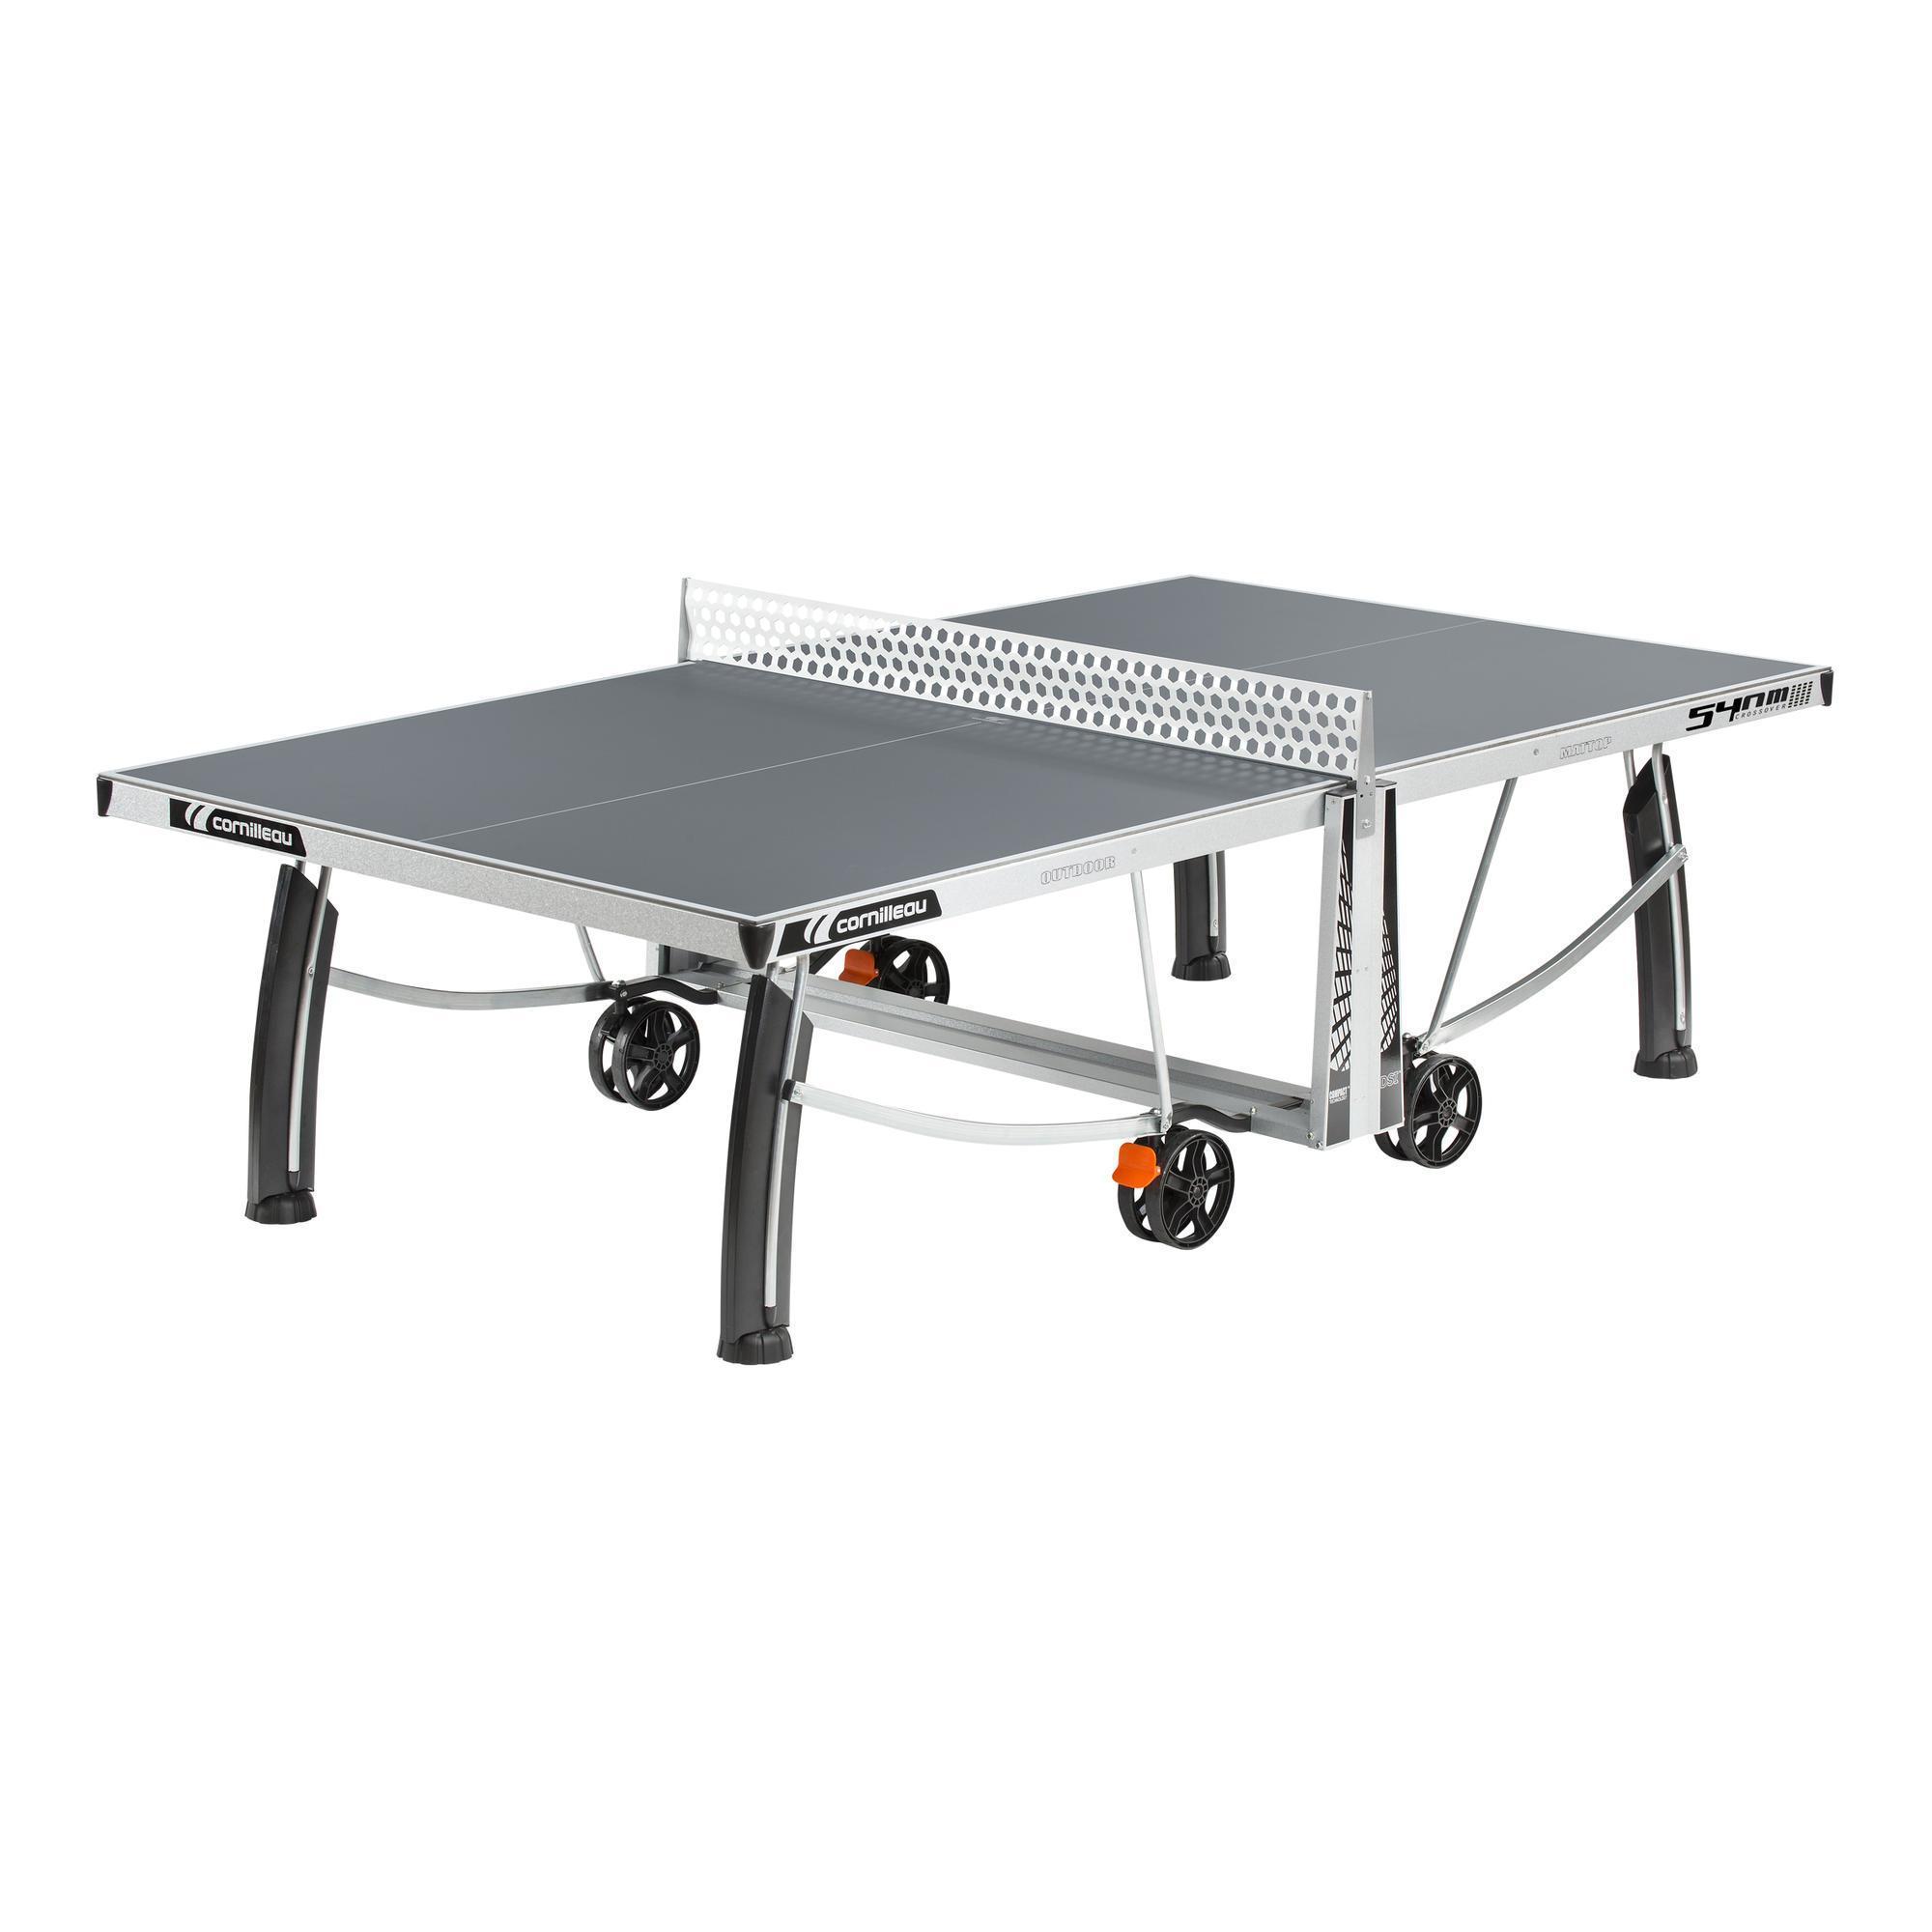 Cornilleau Tafeltennistafel / pingpongtafel outdoor 540M Pro grijs kopen